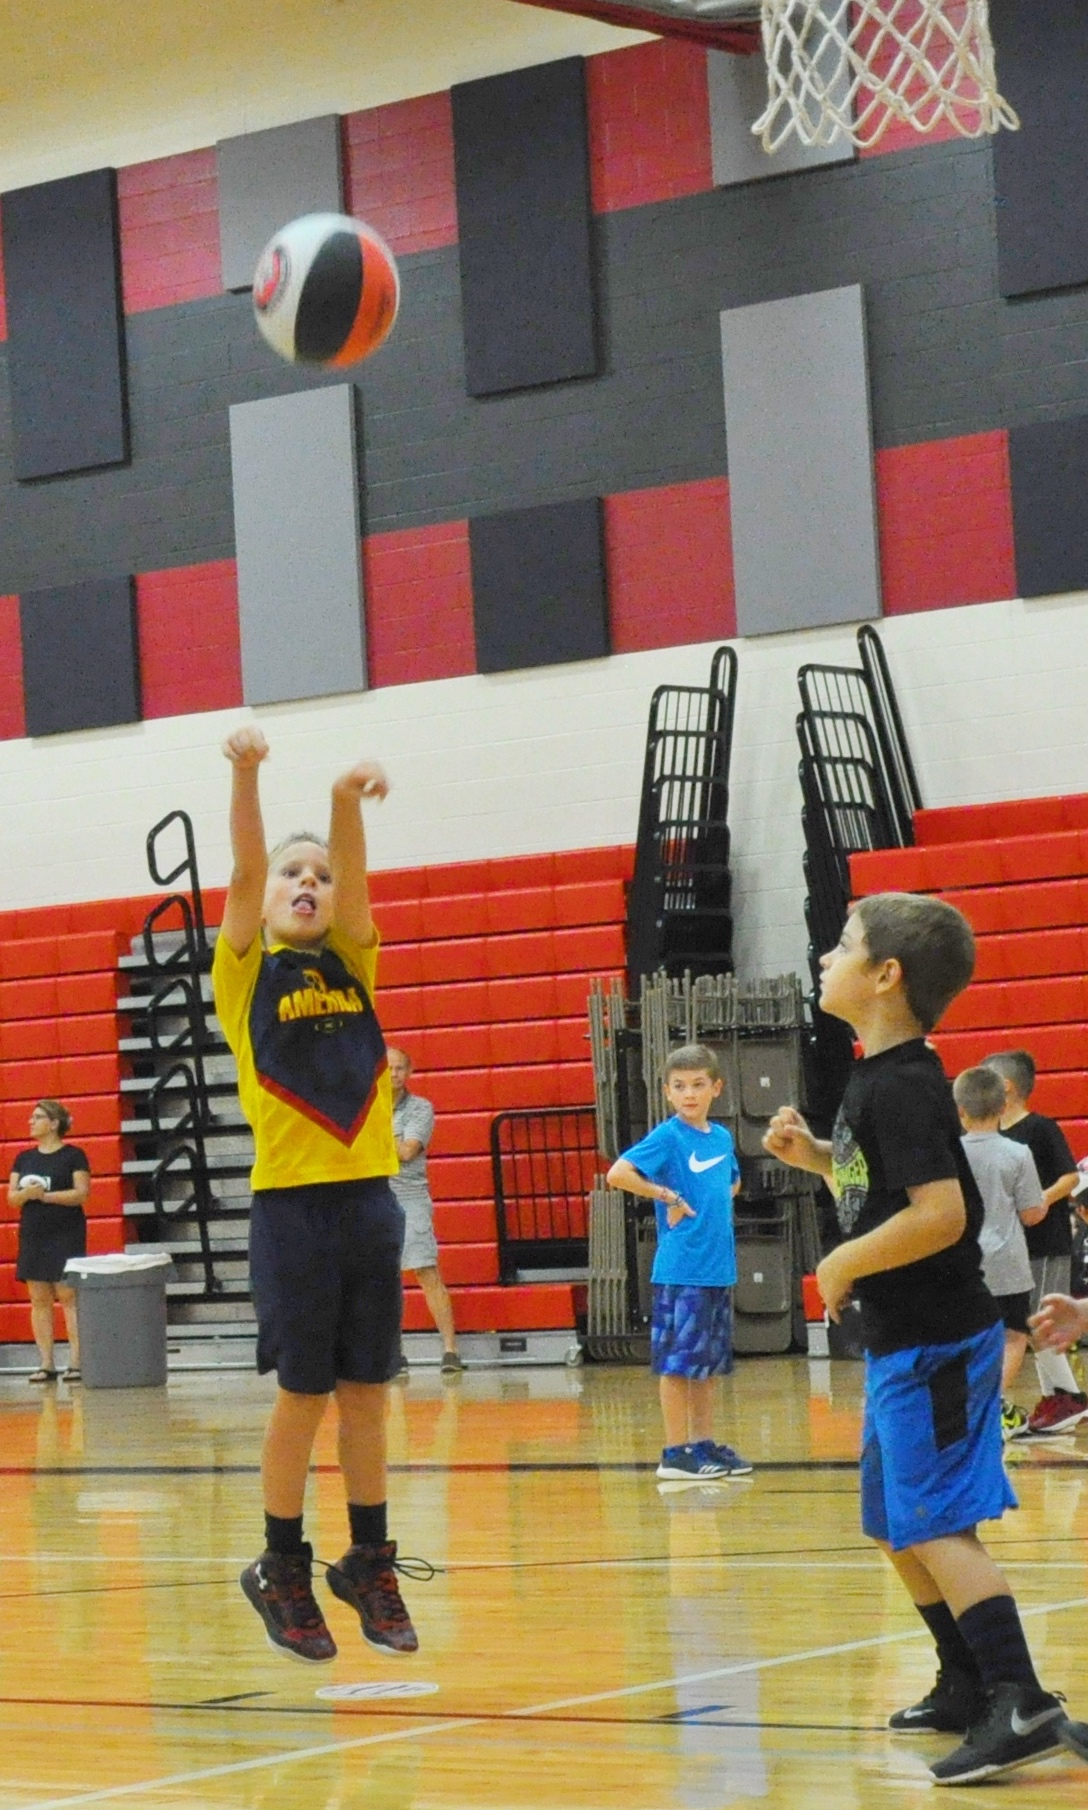 LJ Boys Basketball Caption 6.jpg